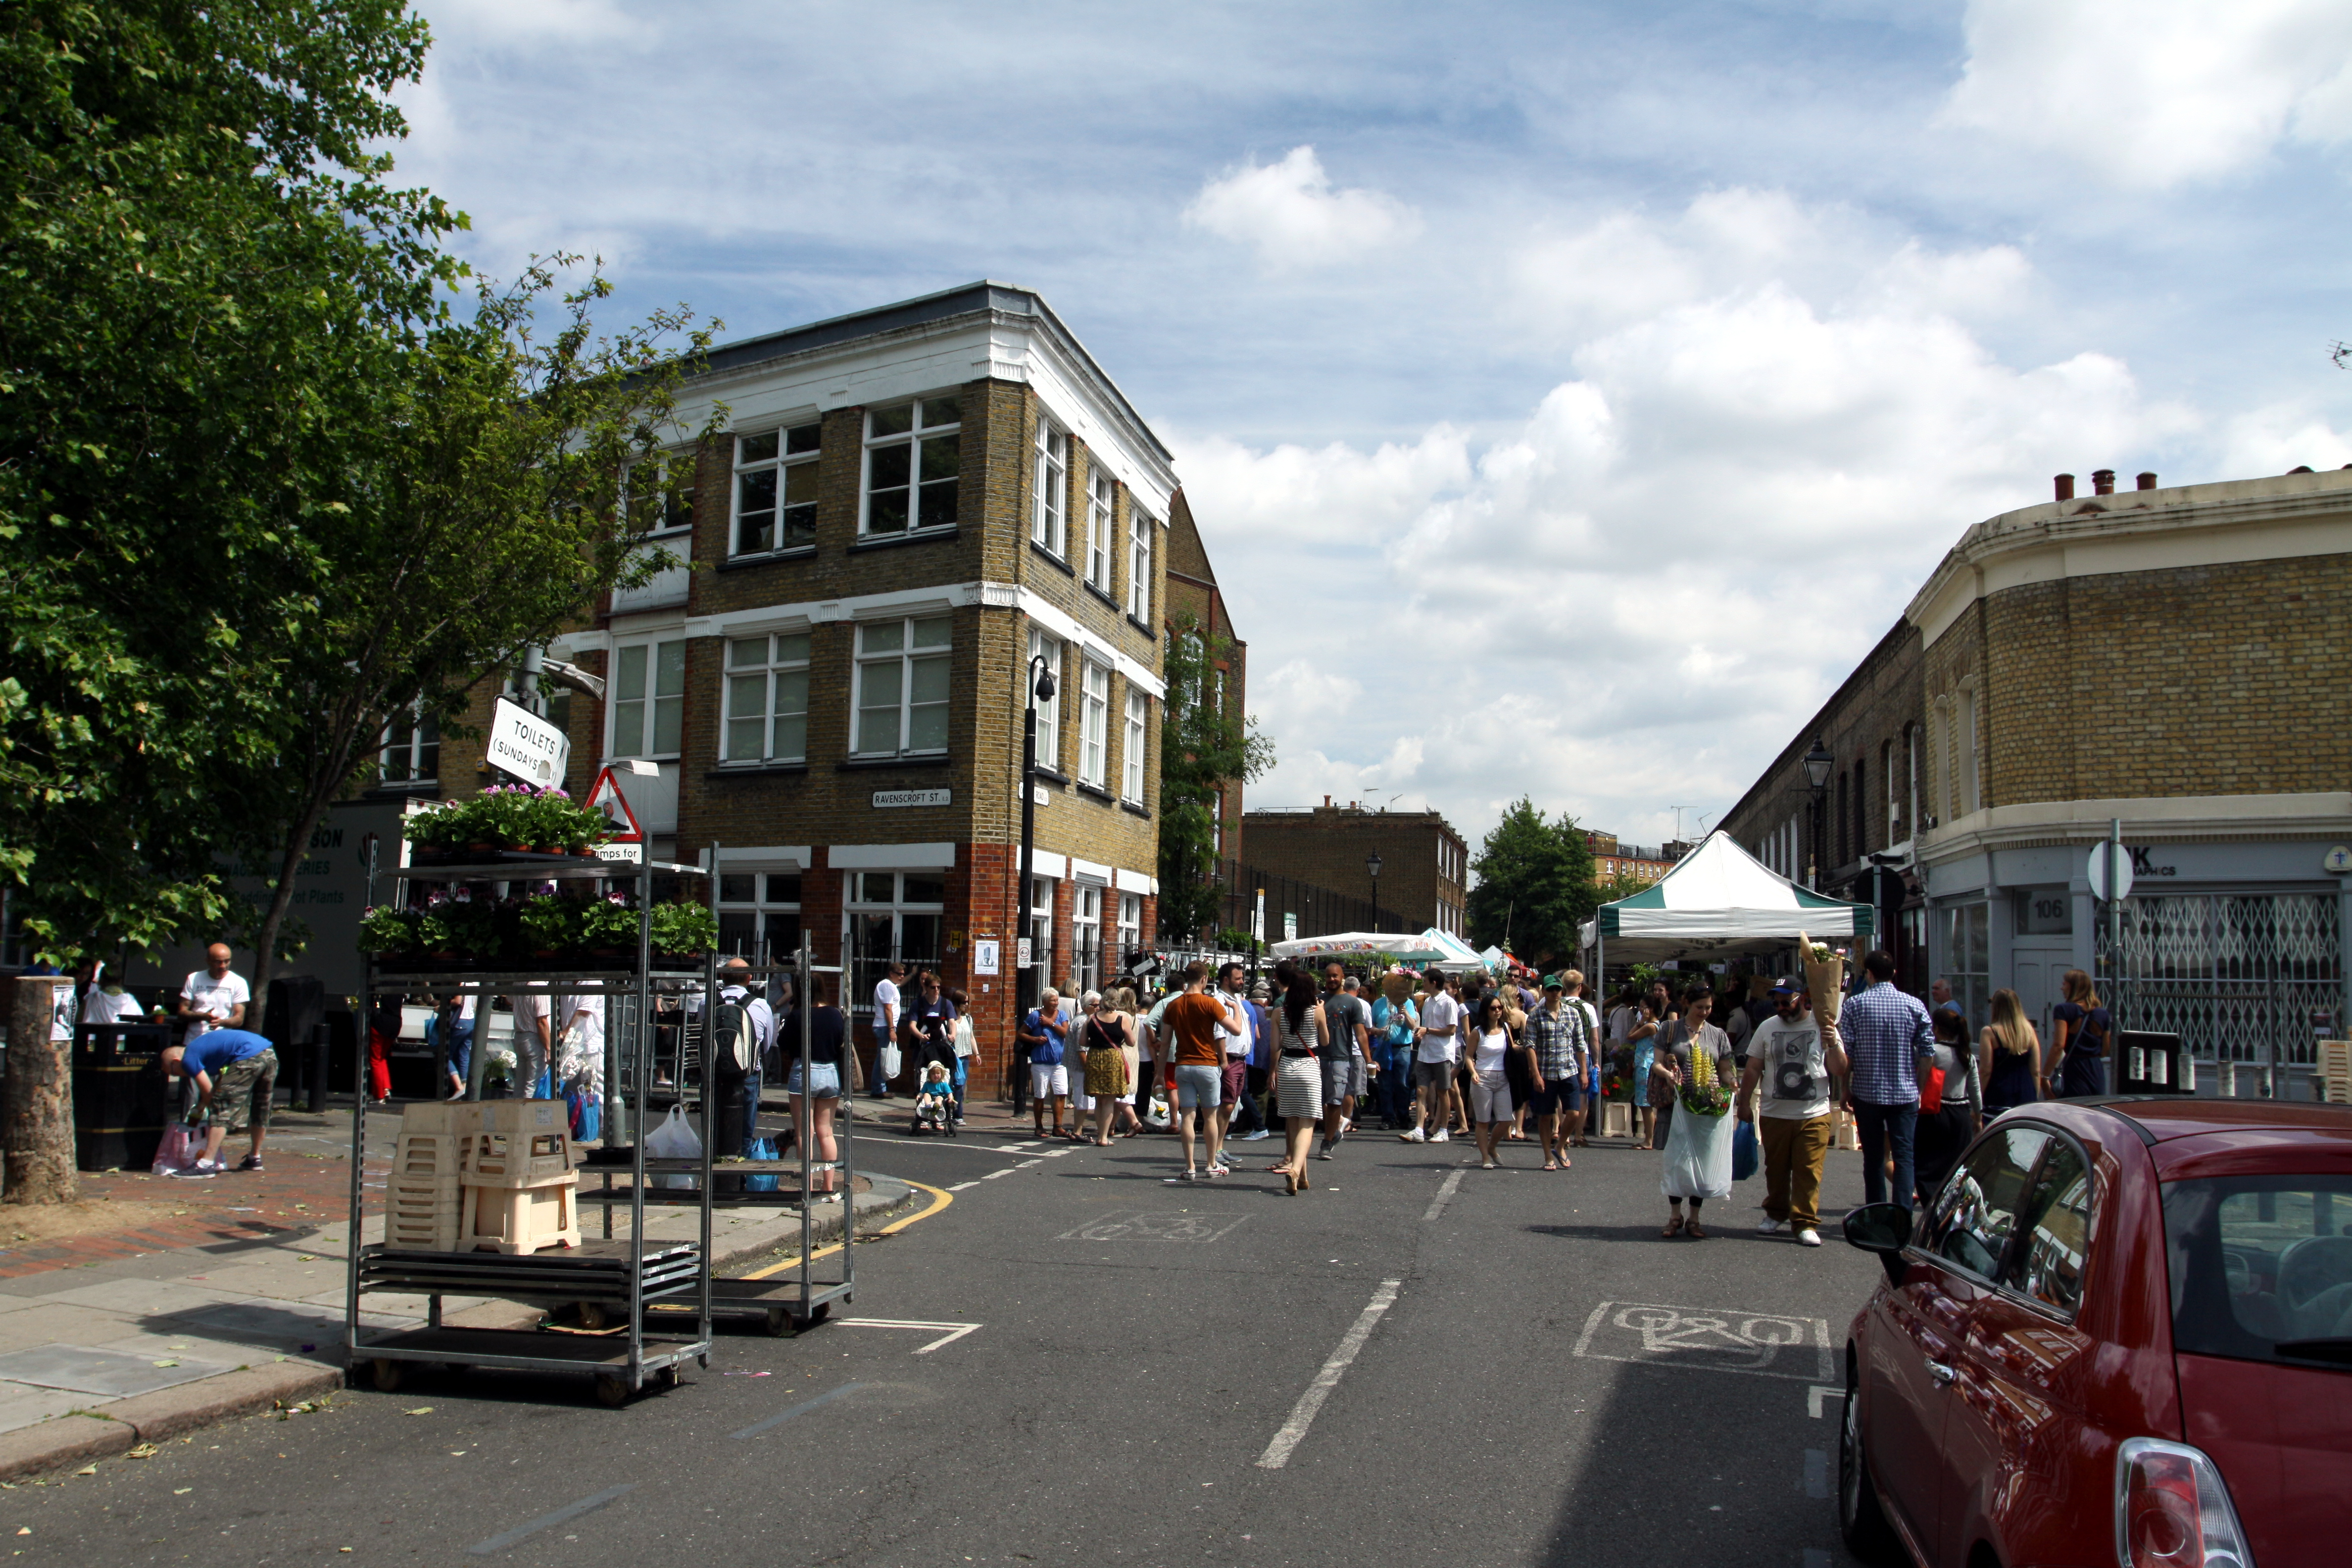 Description Columbia Road market in London, June 2013 (14).jpg